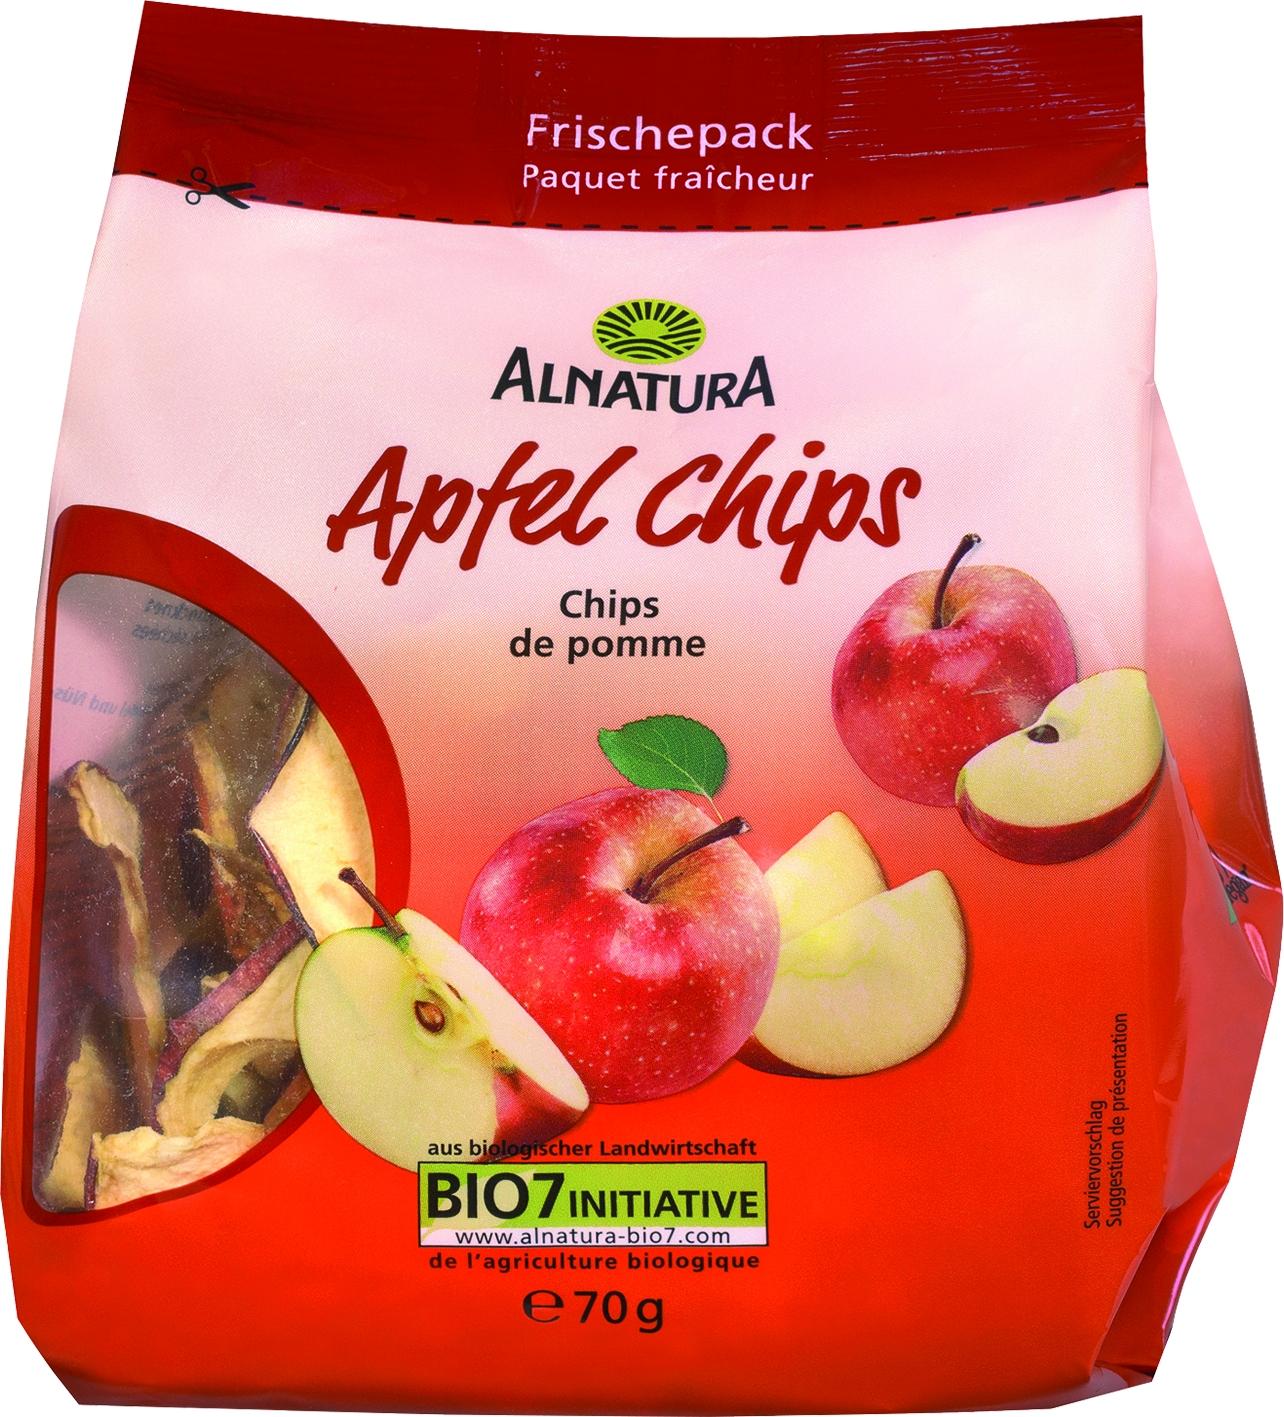 Apfel Chips getrocknet